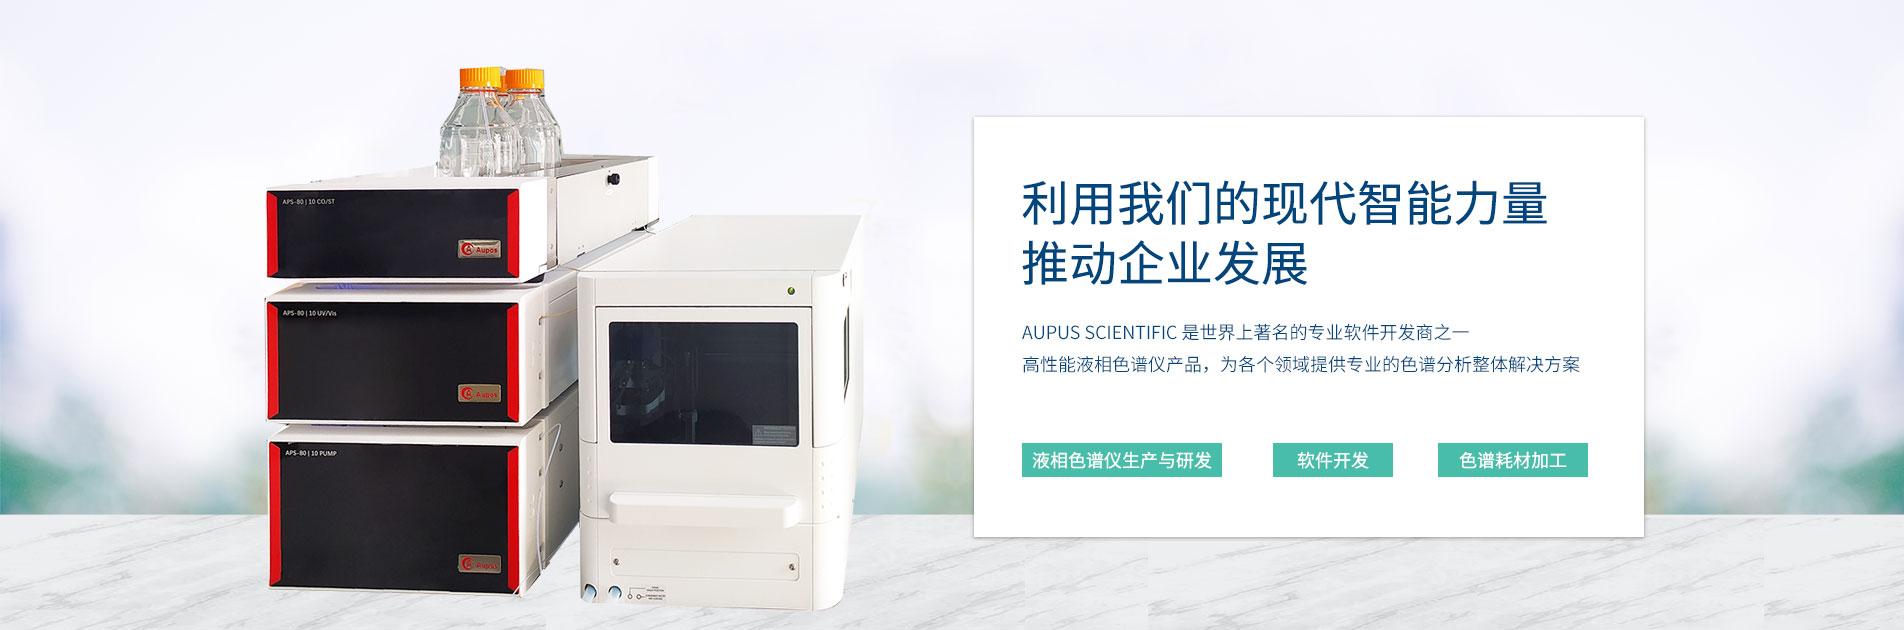 APS80-16D等效高效液相色谱